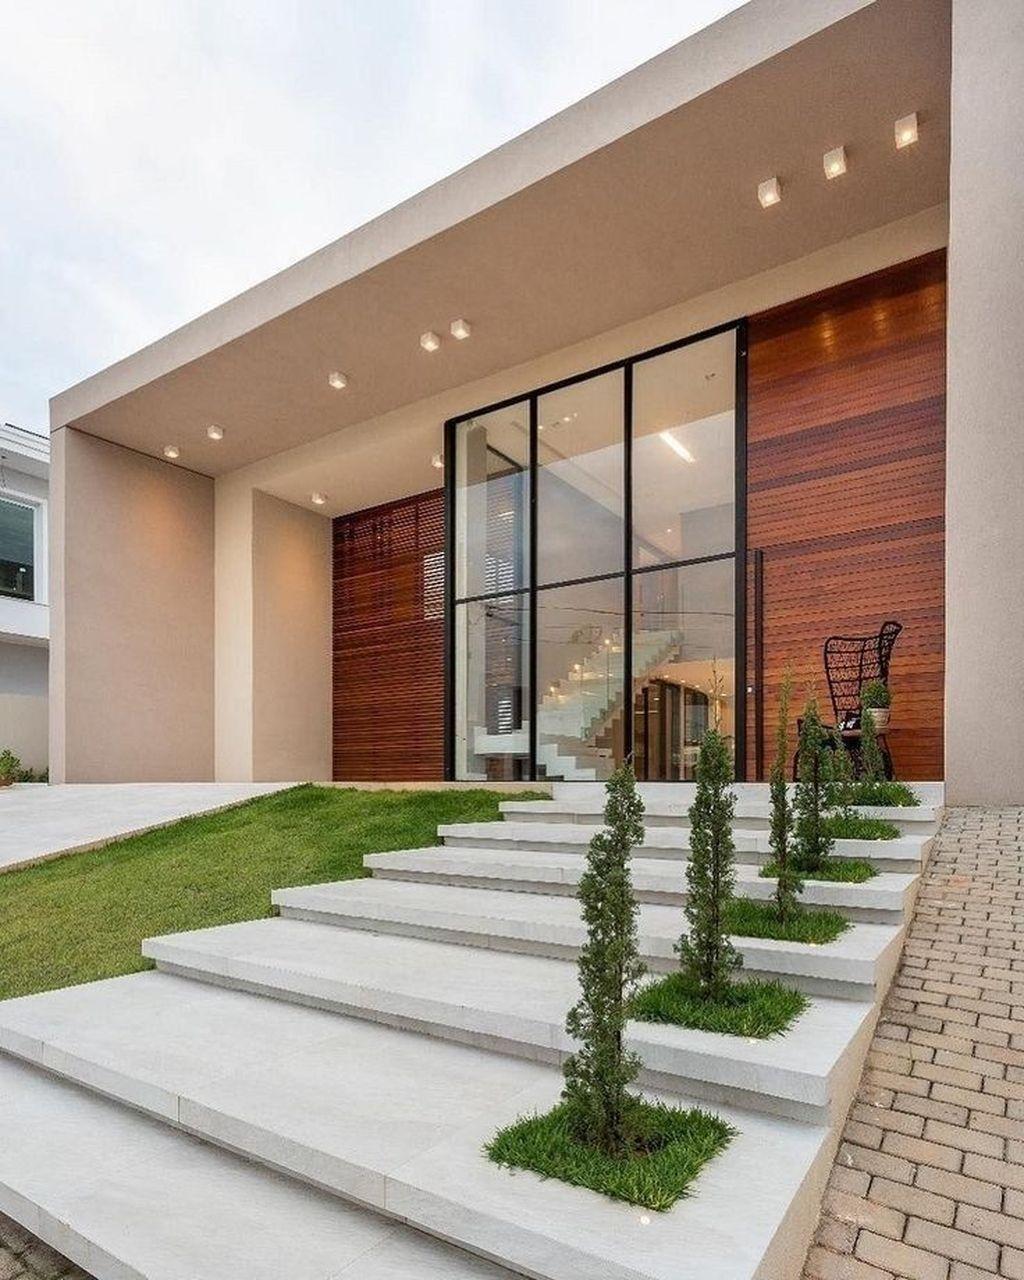 Minimalist Exterior Home Design Ideas: 30+ Charming Minimalist House Plan Ideas That You Can Make